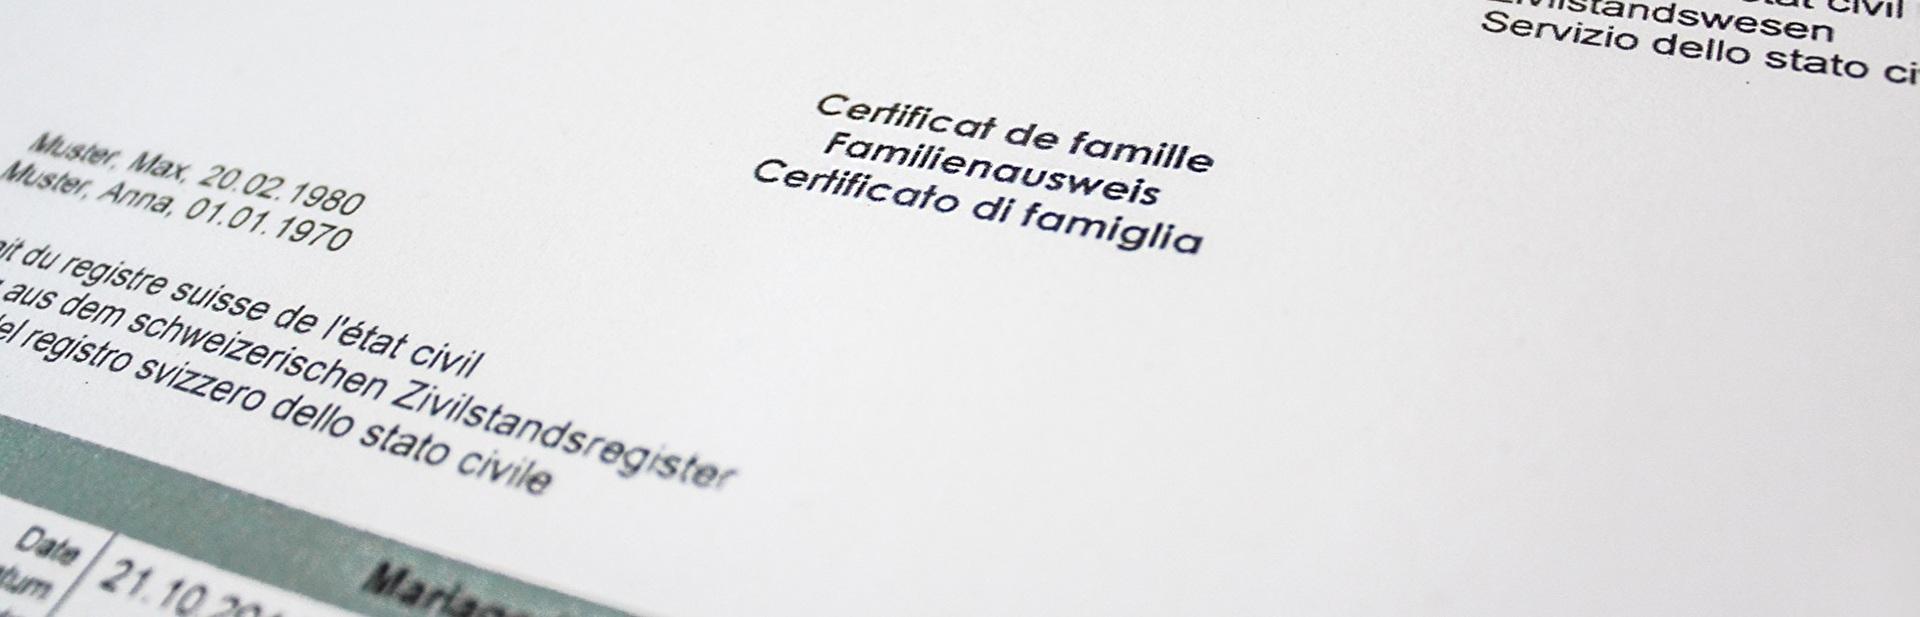 Familienausweis